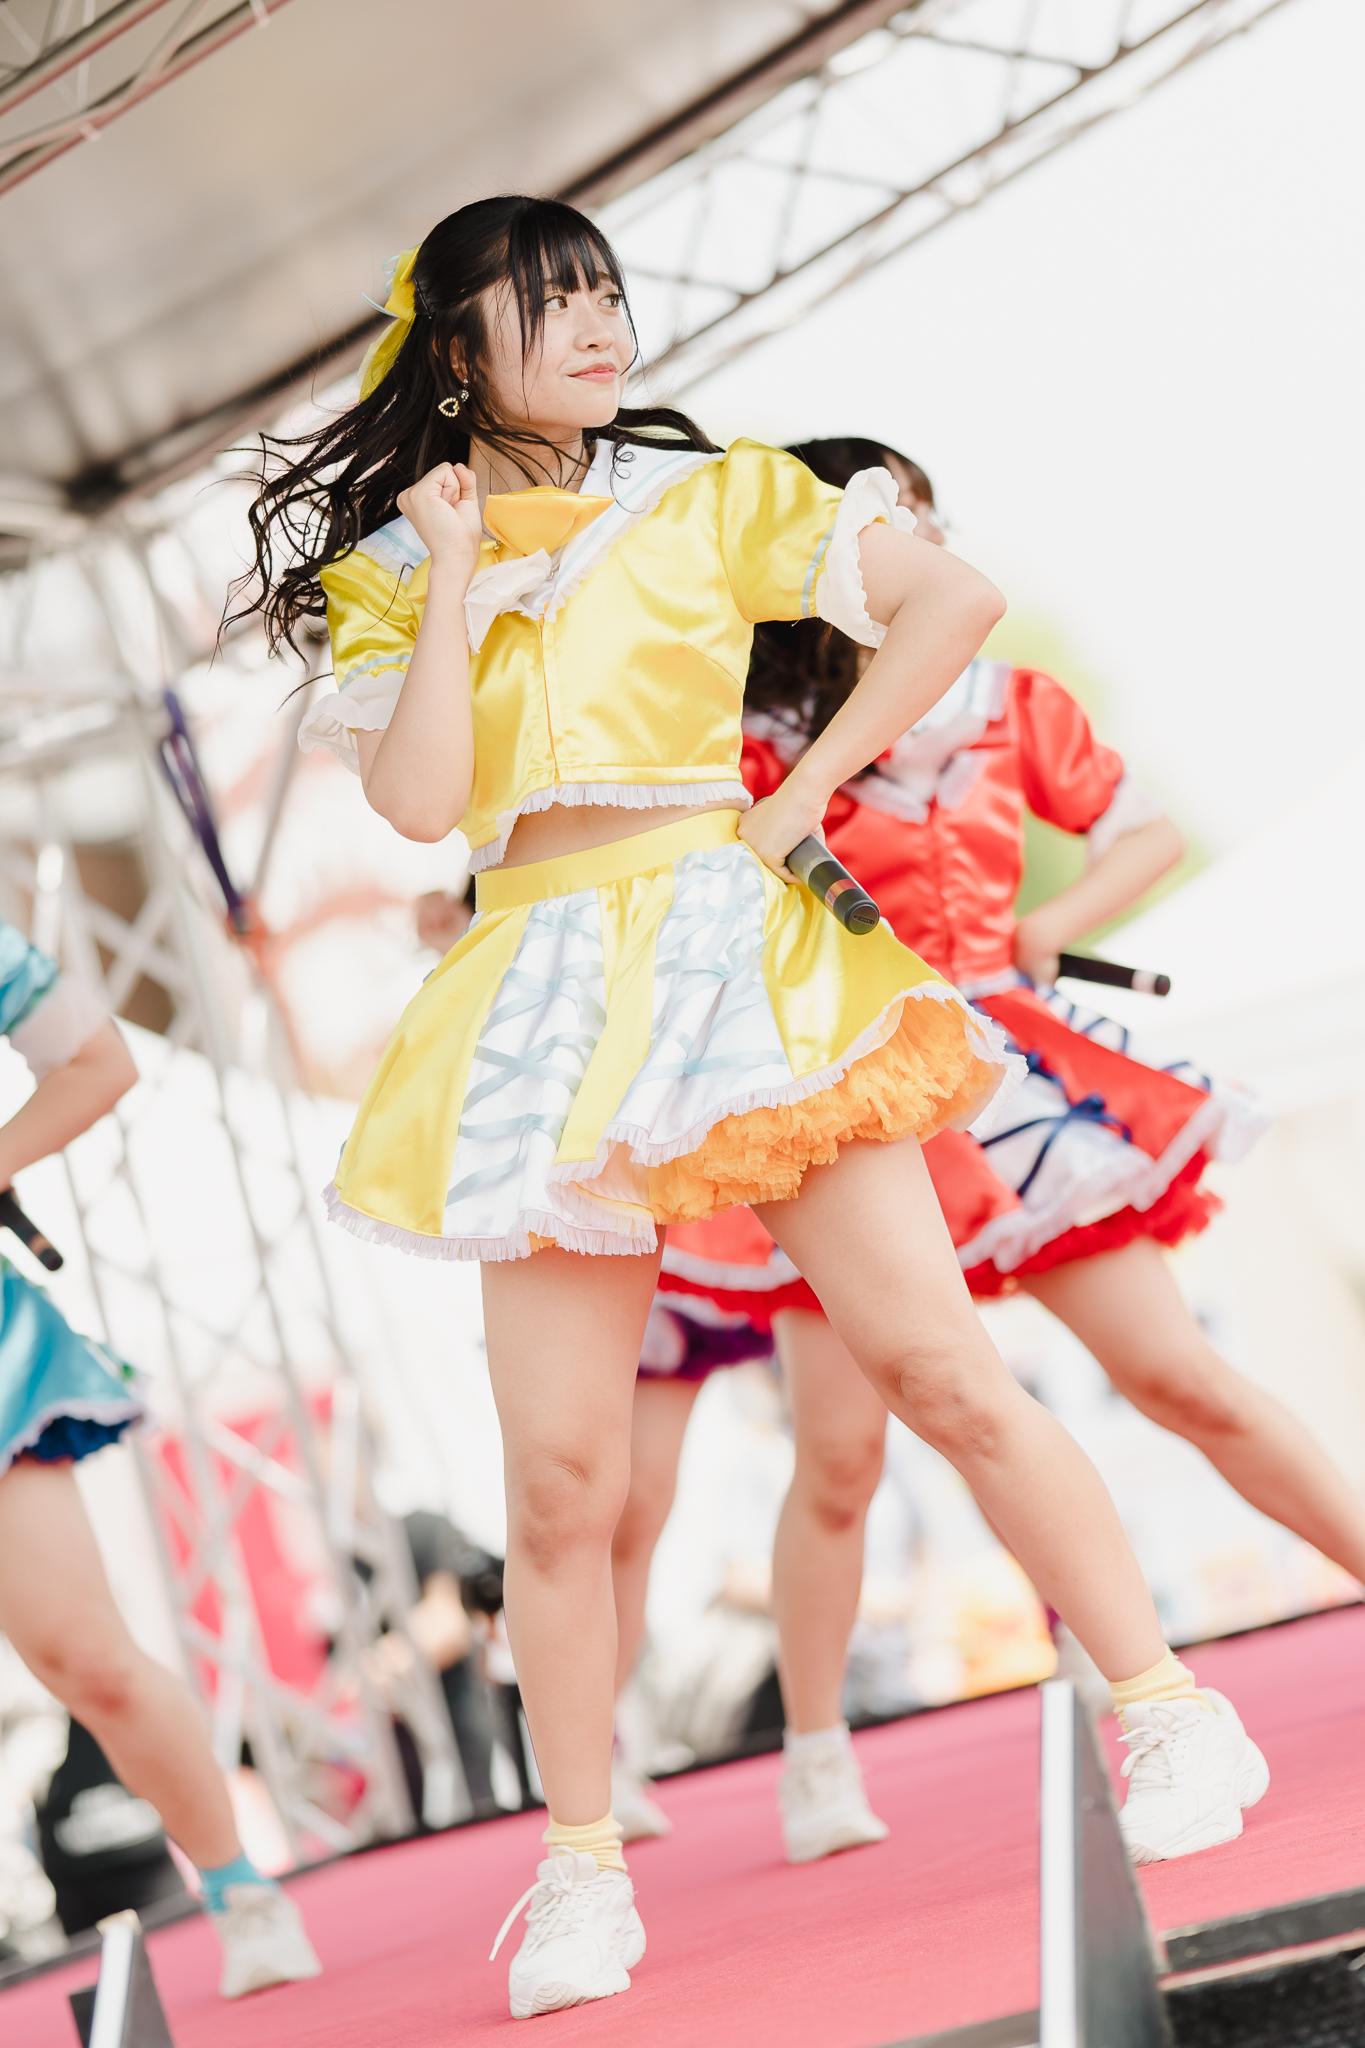 HAPPY少女♪ れいか ( 鳴海れいか ) | お宝百貨店万代藤野店「SUMMER FESTIVAL 2021」1日目